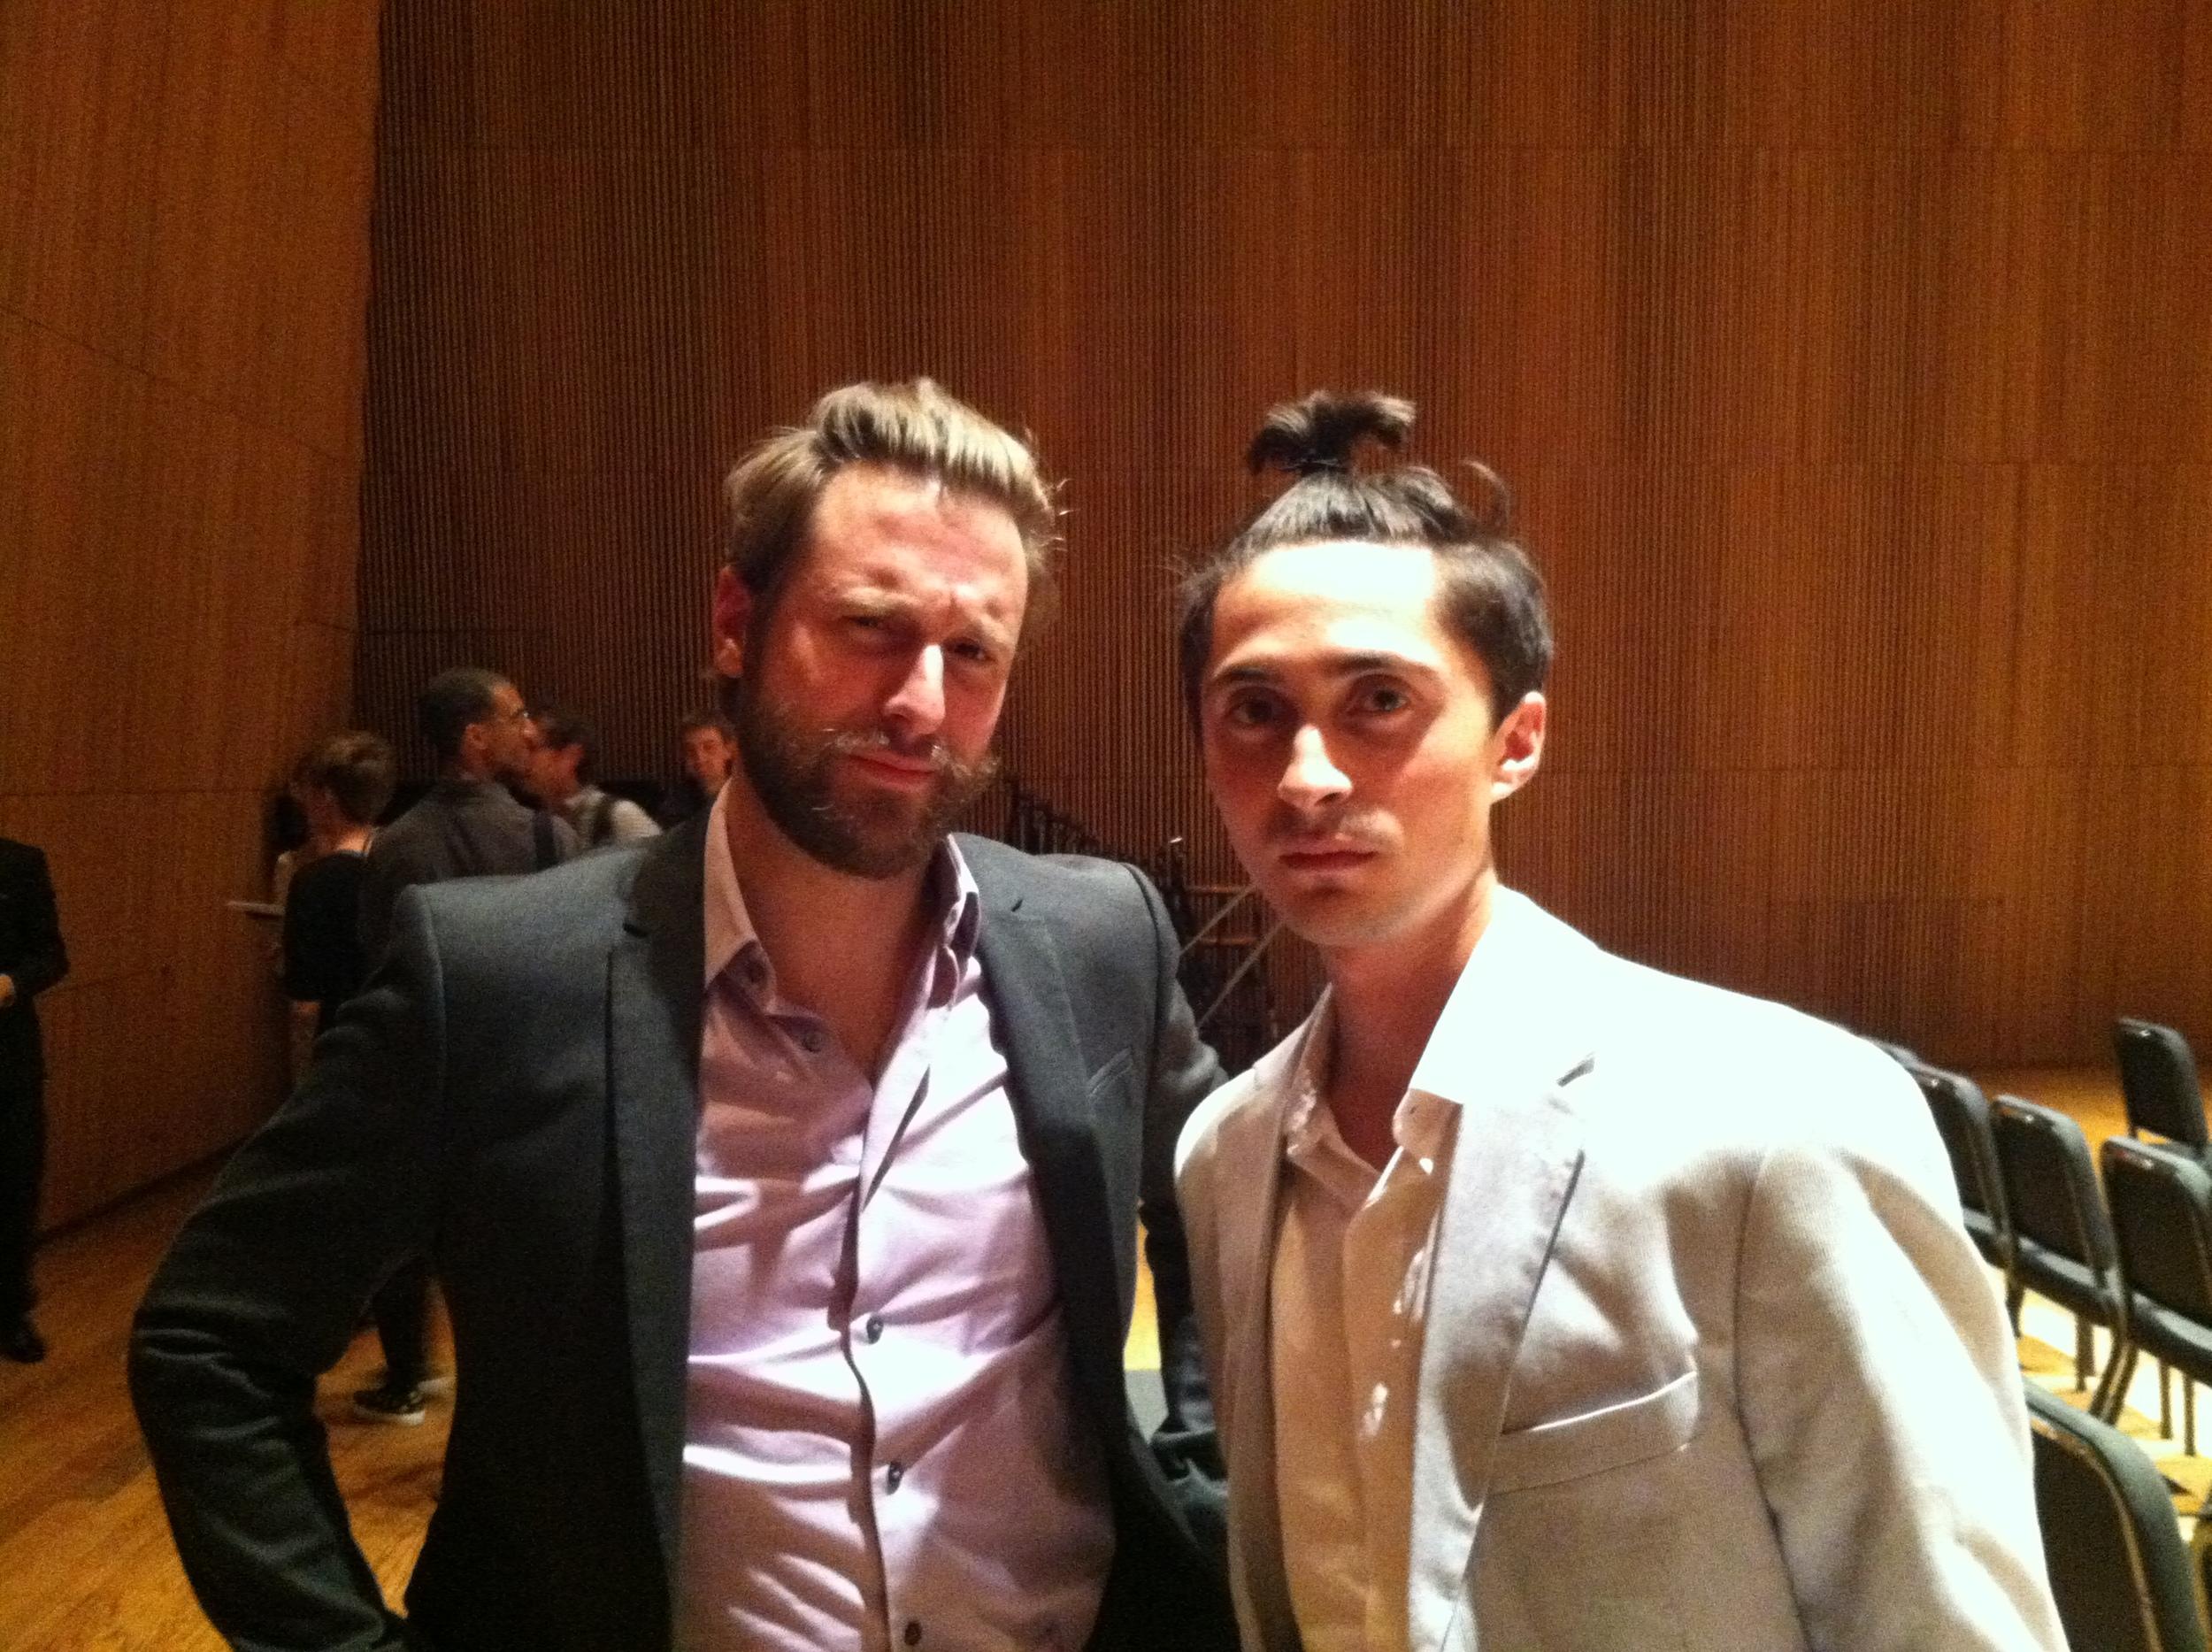 Man-buns with Jesse Blumberg